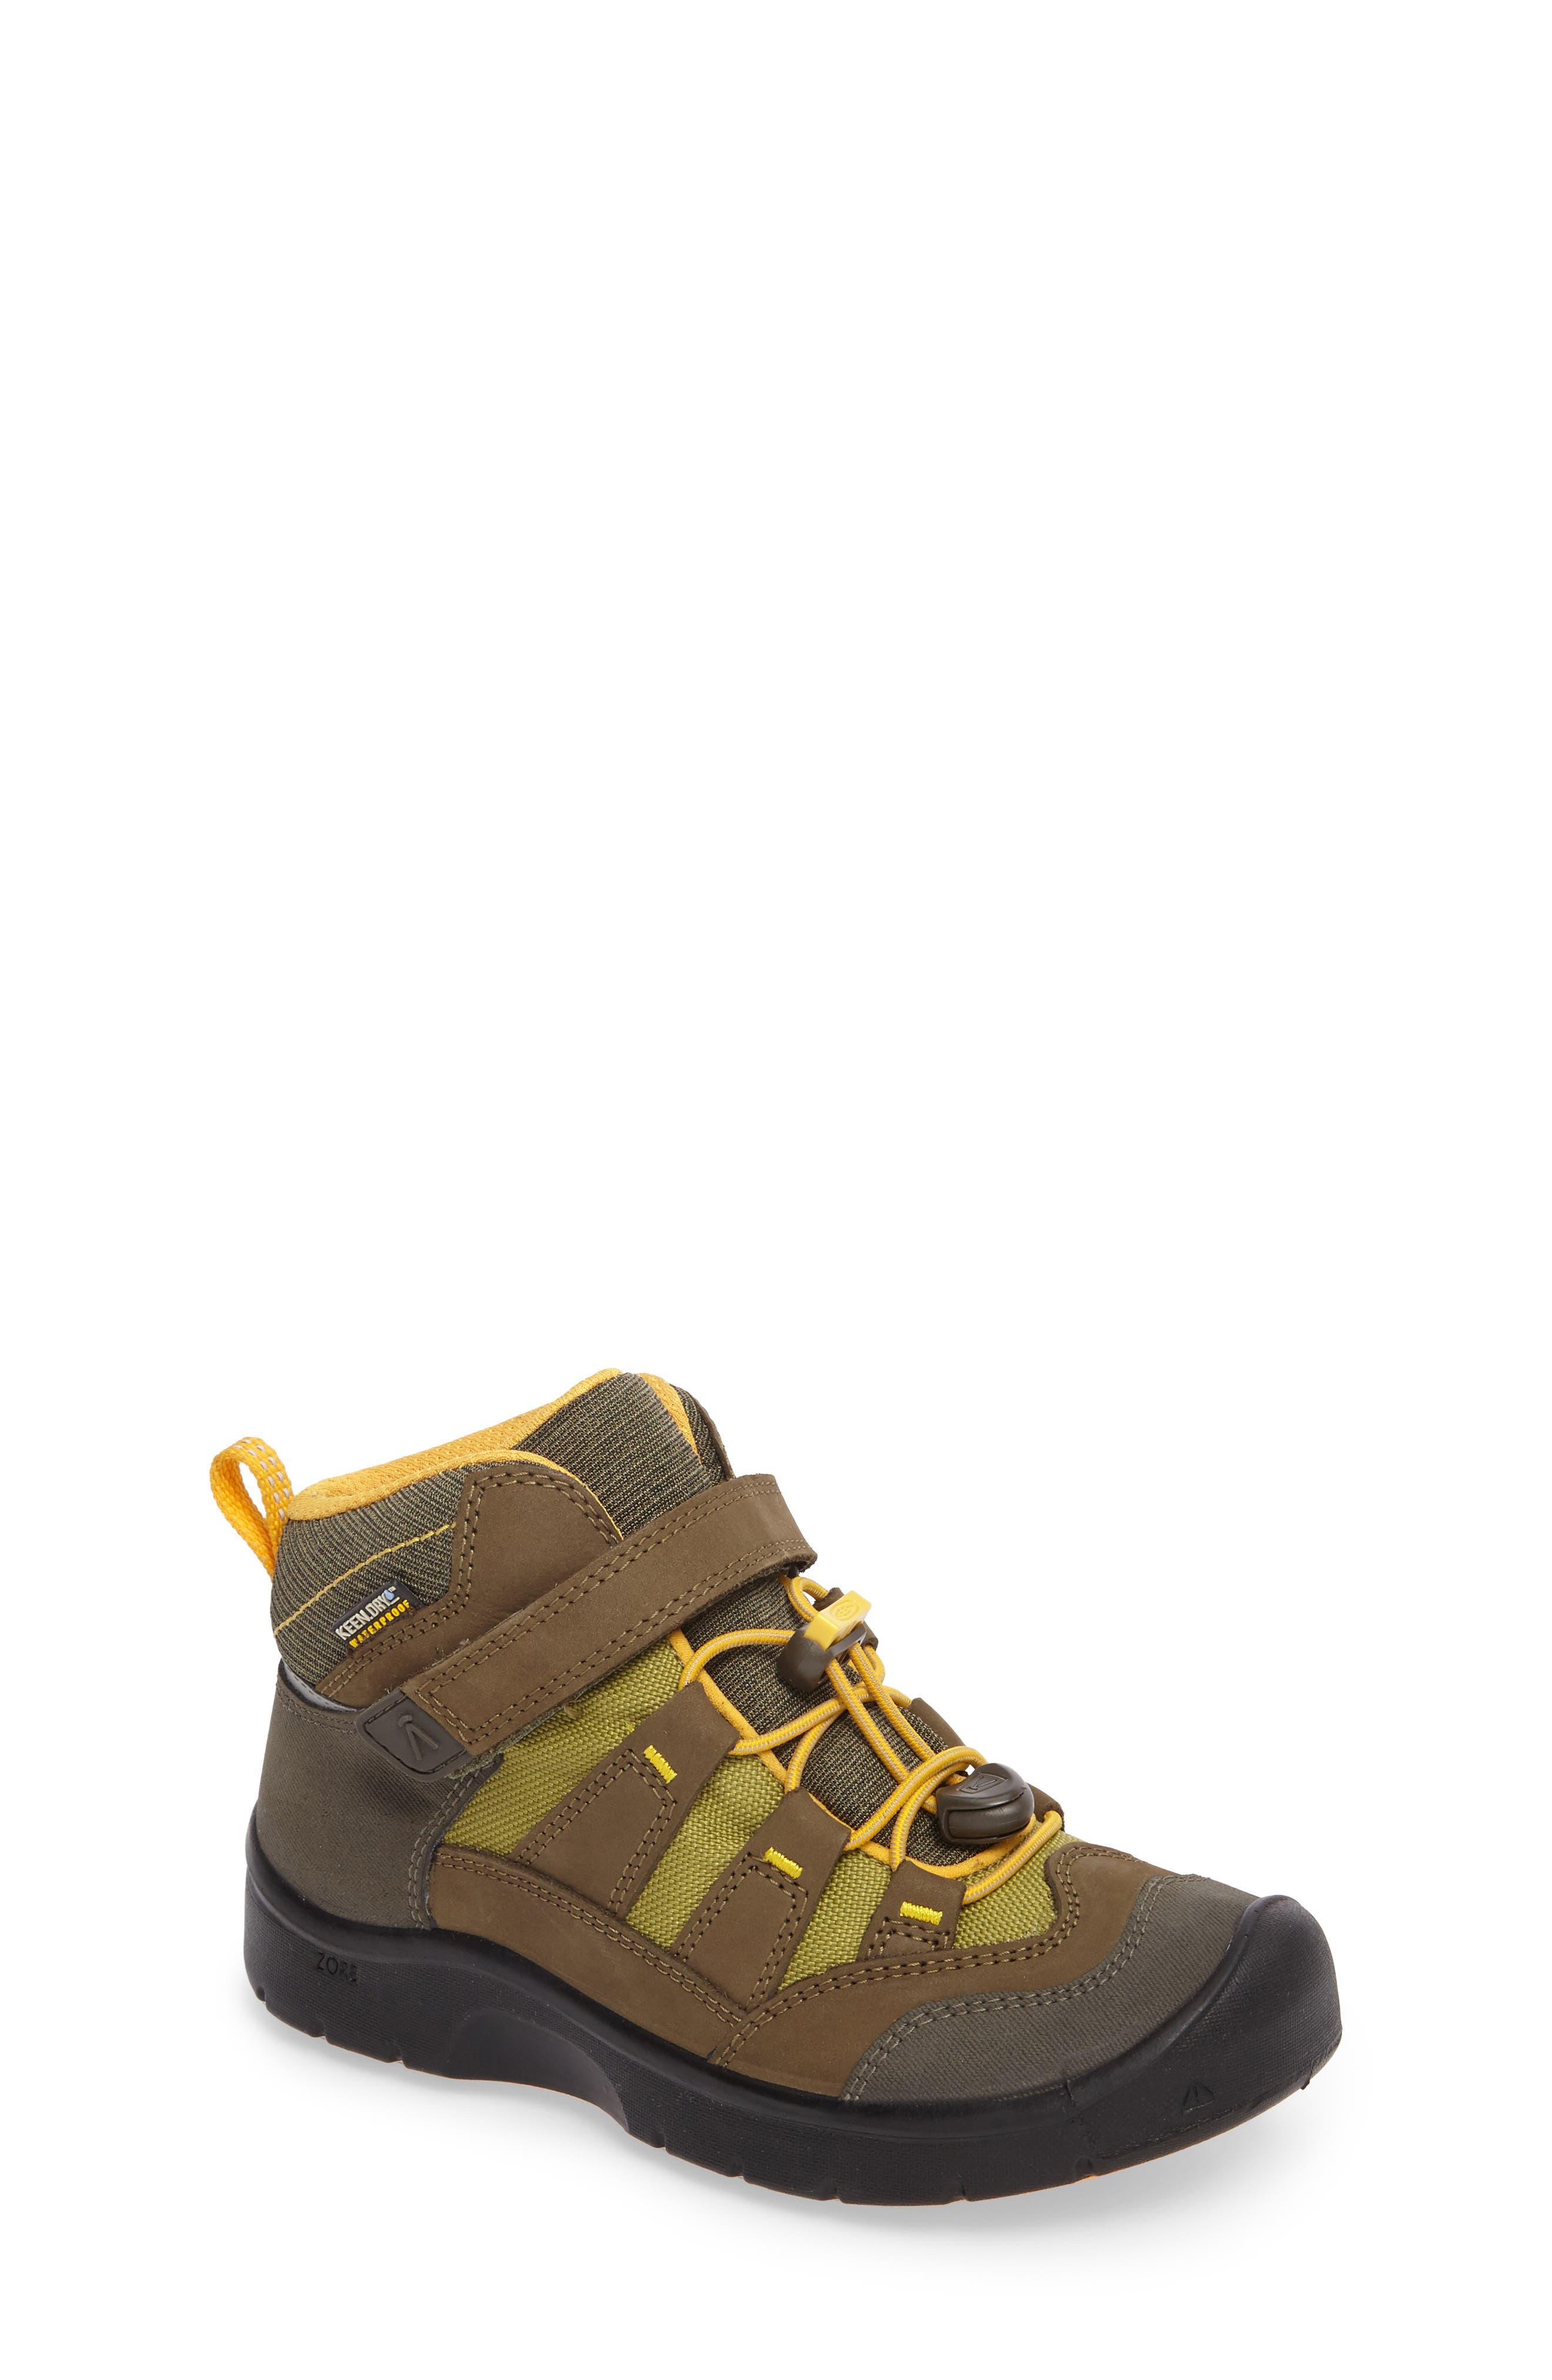 Keen Hikeport Strap Waterproof Mid Boot (Toddler, Little Kid & Big Kid)